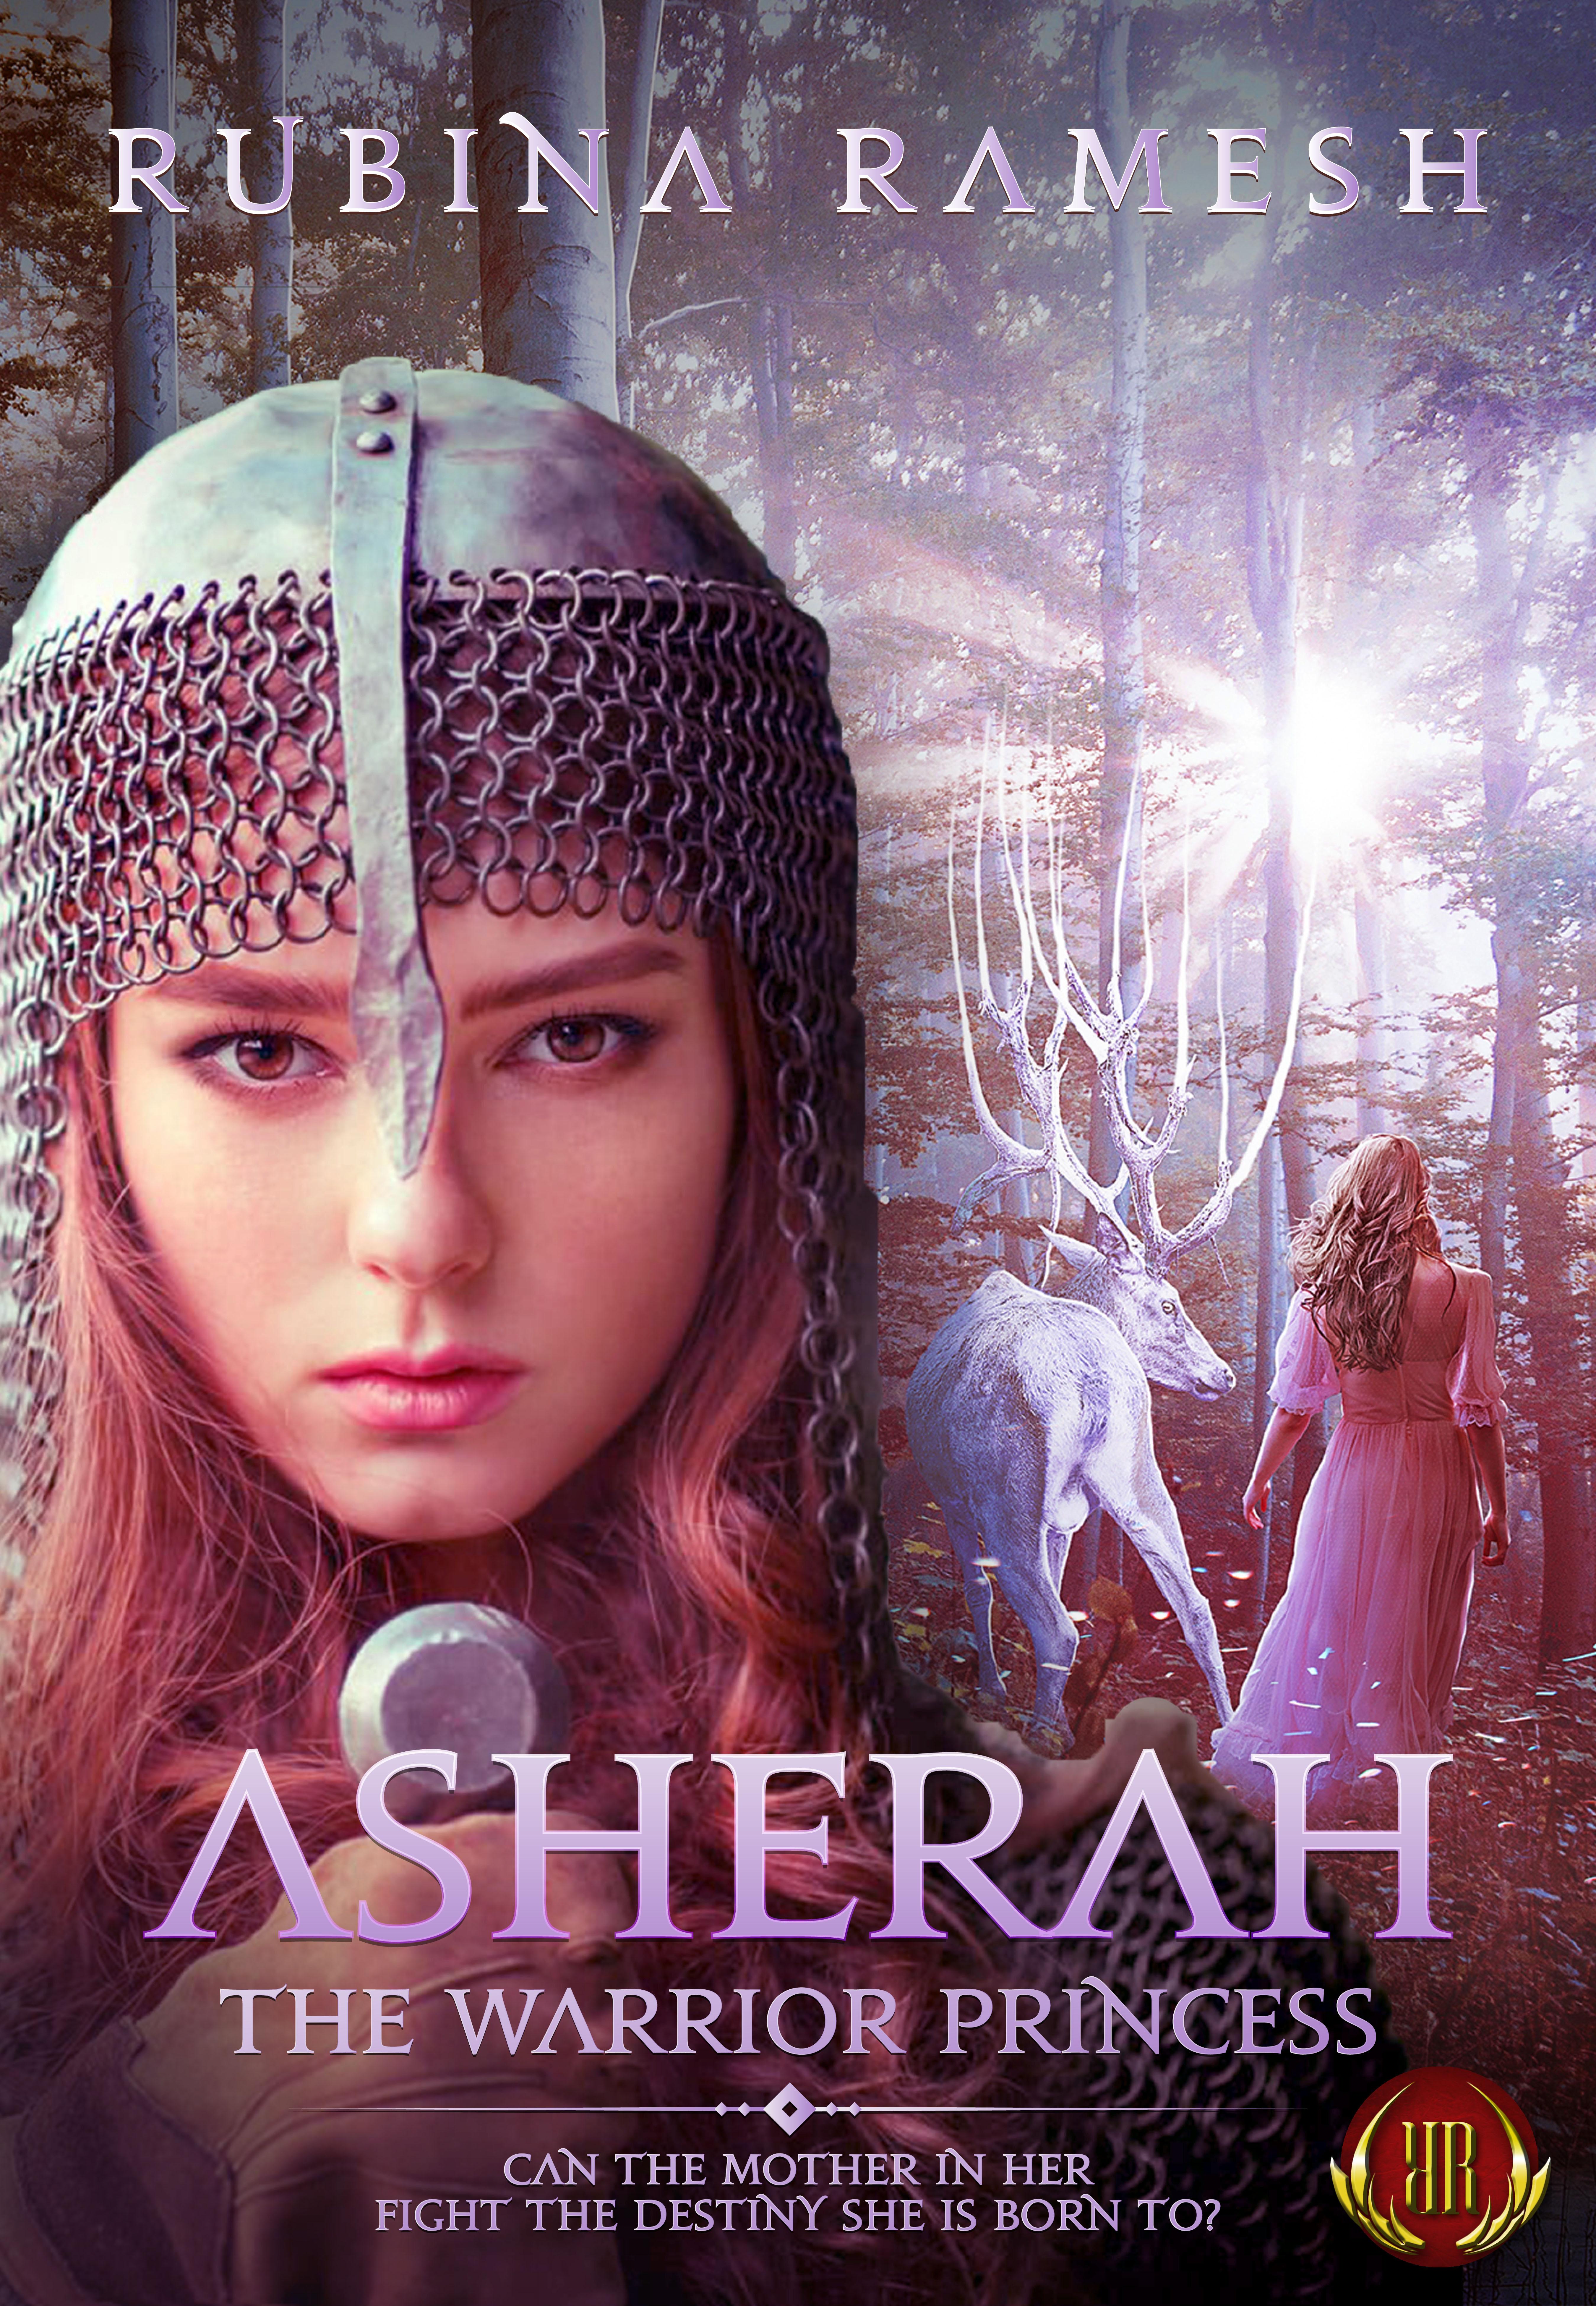 Asherah: The Warrior Princess: A Fantasy Romance (The Goddesses Trilogy Book 1)